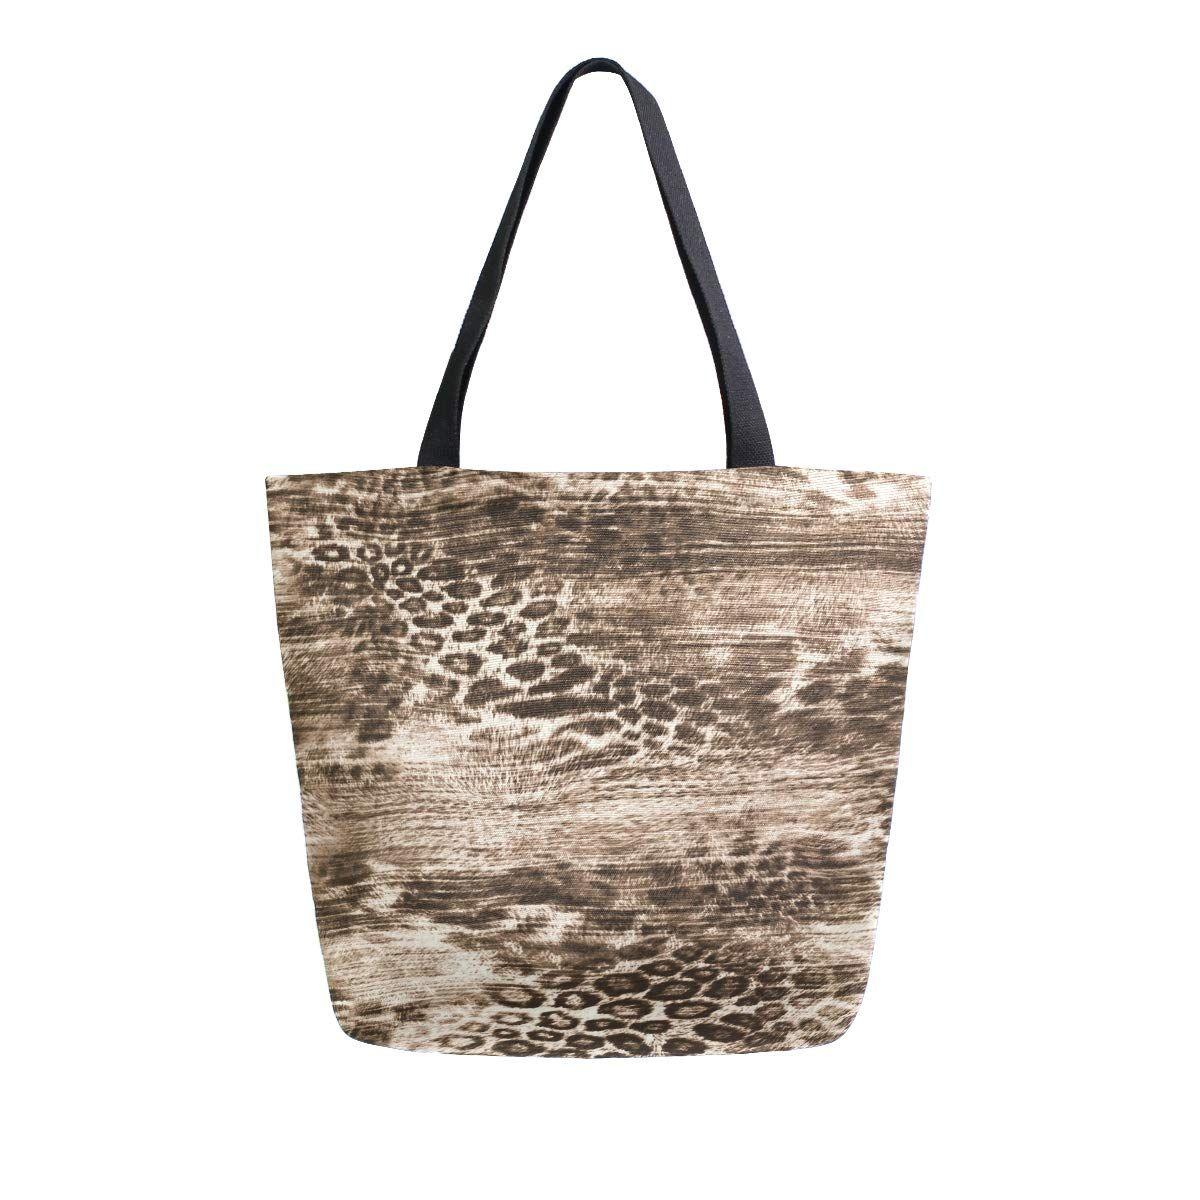 Top Handle Handbags Shoulder Tote Bag Leopard Animal Print Tote Washed Canvas Purses Bag for Women Girls